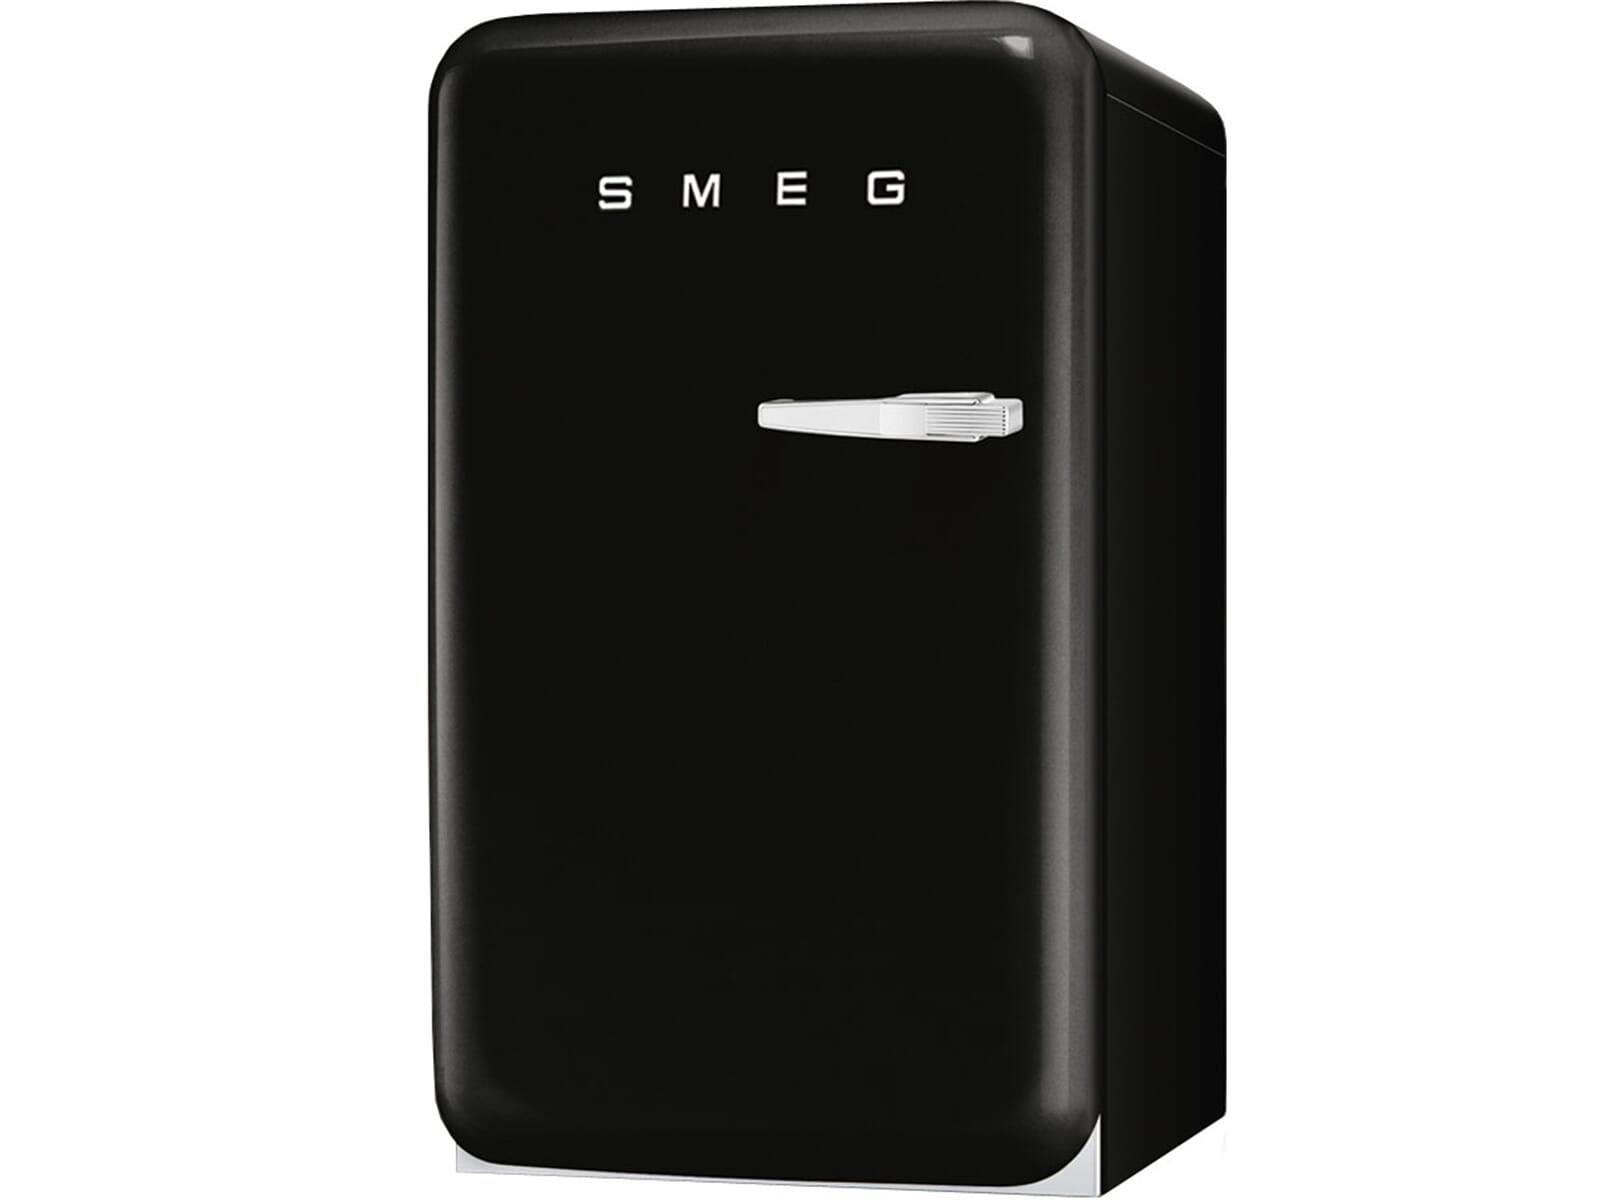 Smeg Kühlschrank Verkaufen : Smeg küchengeräte kühlschränke herde ofen geschirrspüler